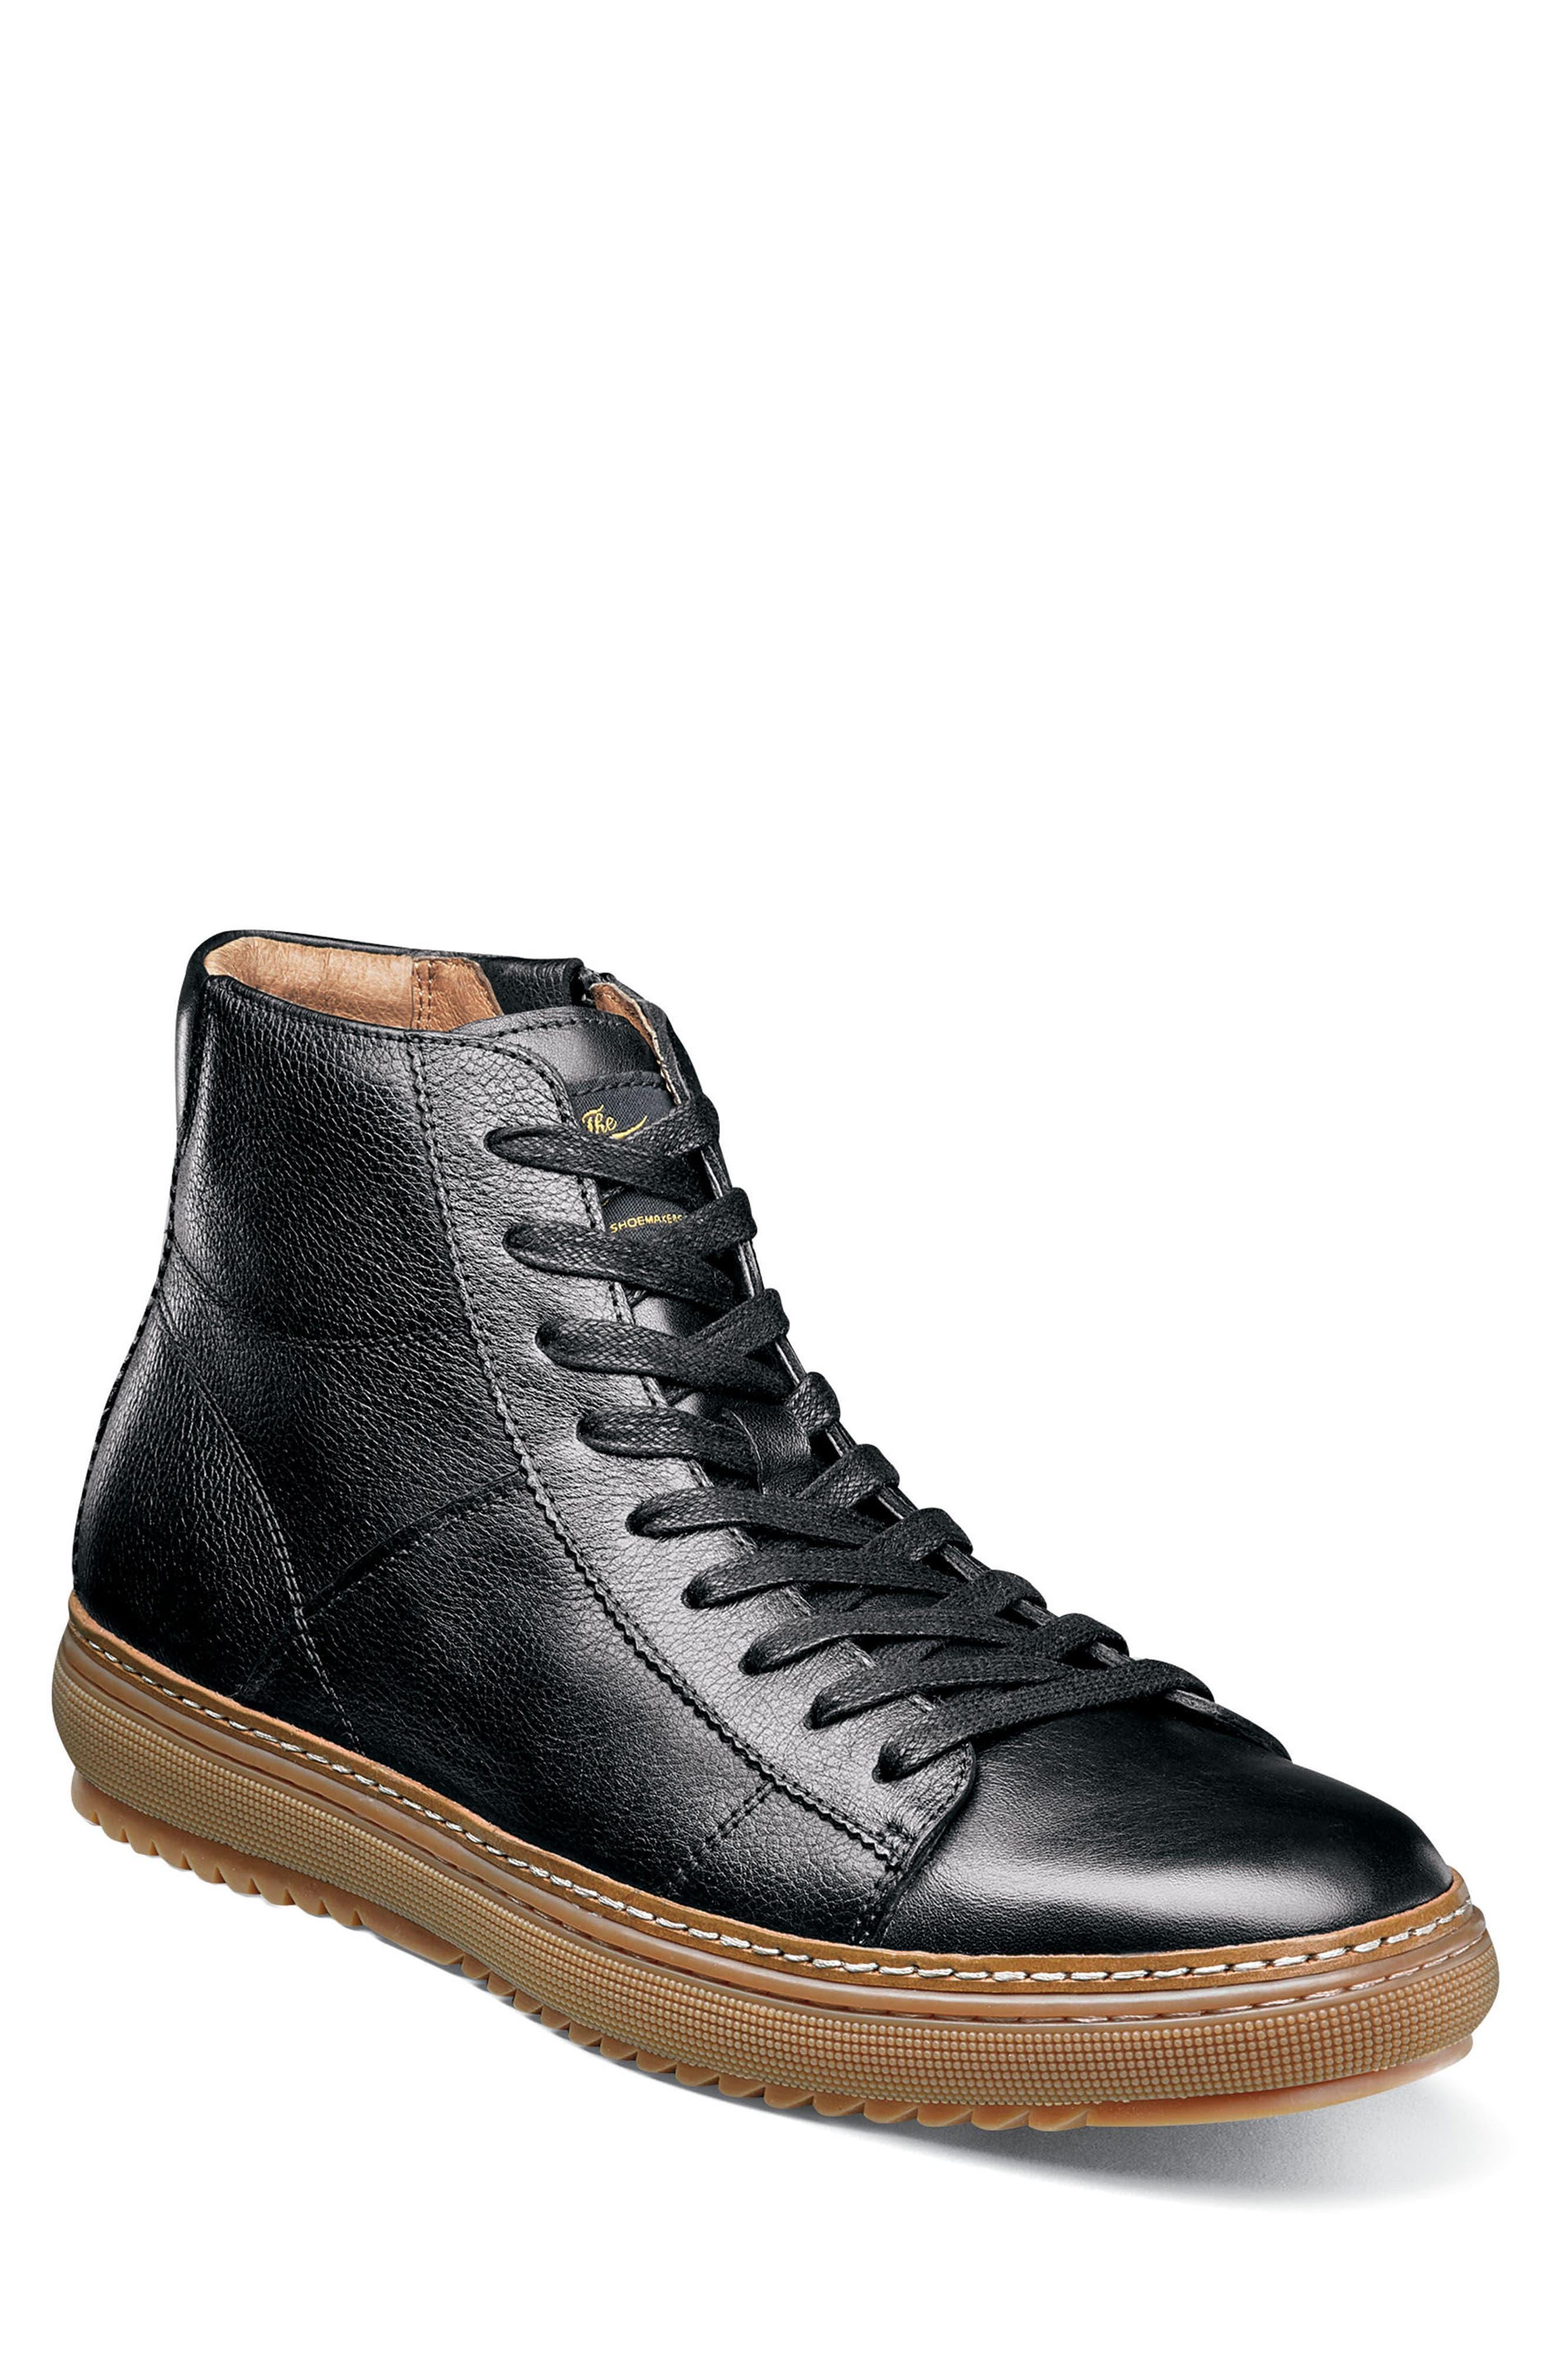 Crew Sneaker,                             Main thumbnail 1, color,                             Black